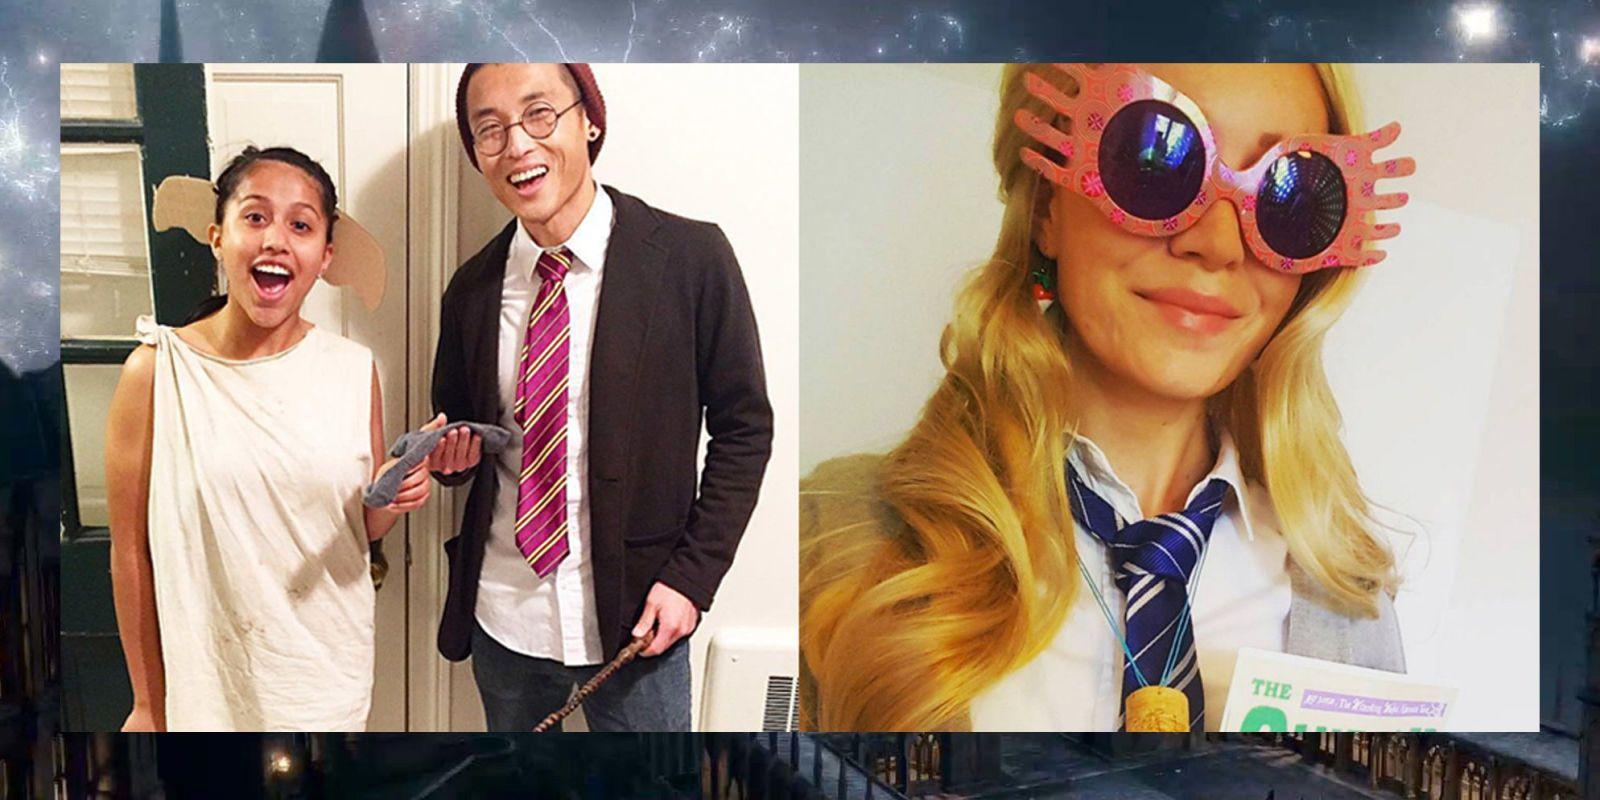 image  sc 1 th 159 & 15 Harry Potter Halloween Costume Ideas - Best DIY Harry Potter Costumes